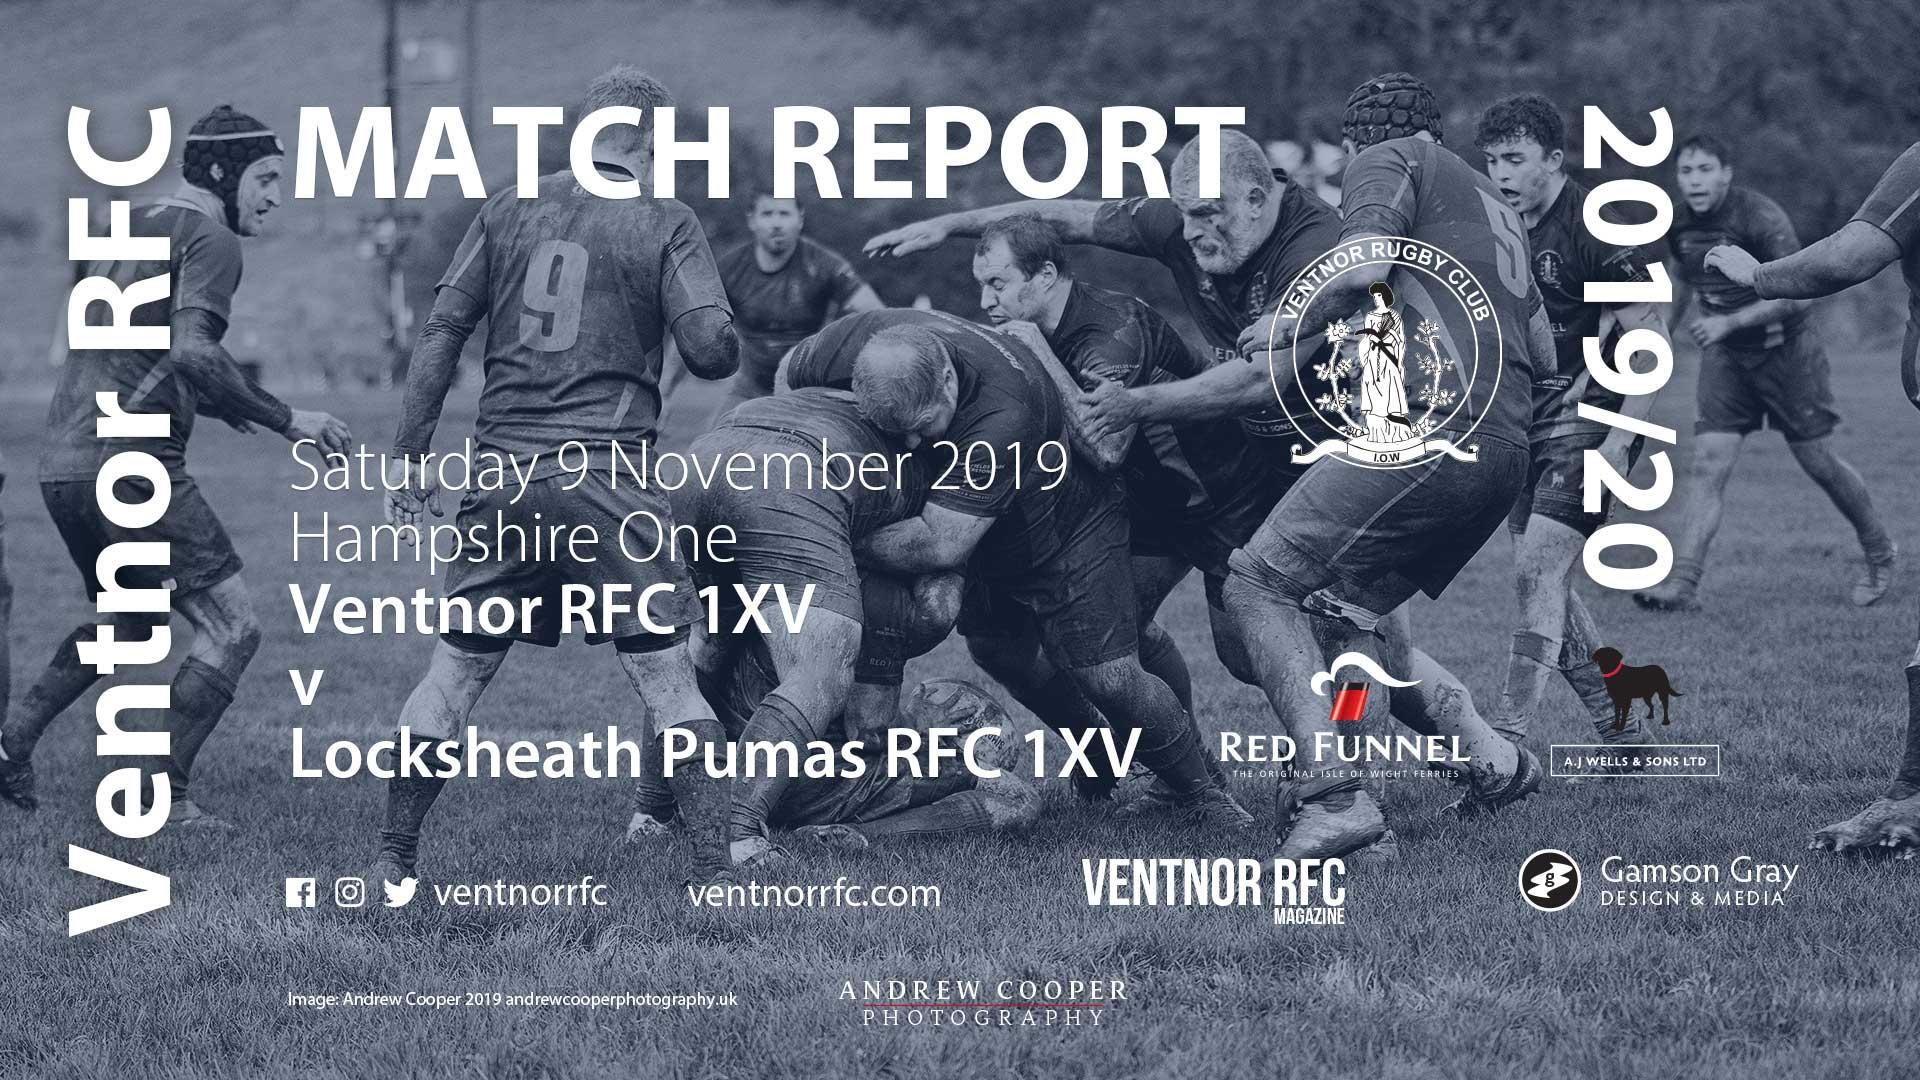 ventnor-rfc-1xv-v-locksheaht-pumas-rfc-1xv-match-report-9-november-2019-ventnor-rfc-facebook-news